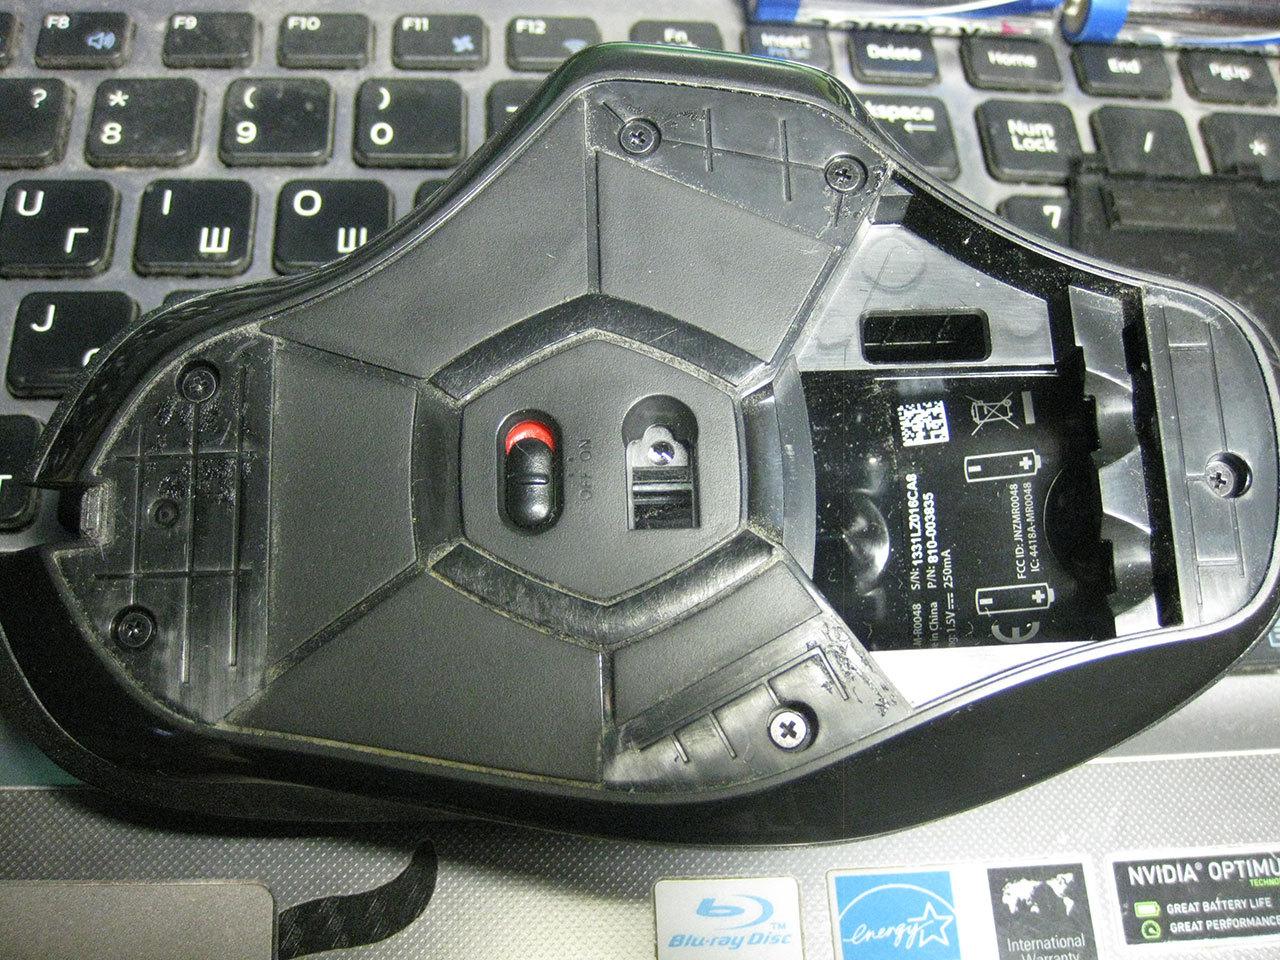 Замена умершей средней кнопки мыши Logitech G602 - 2